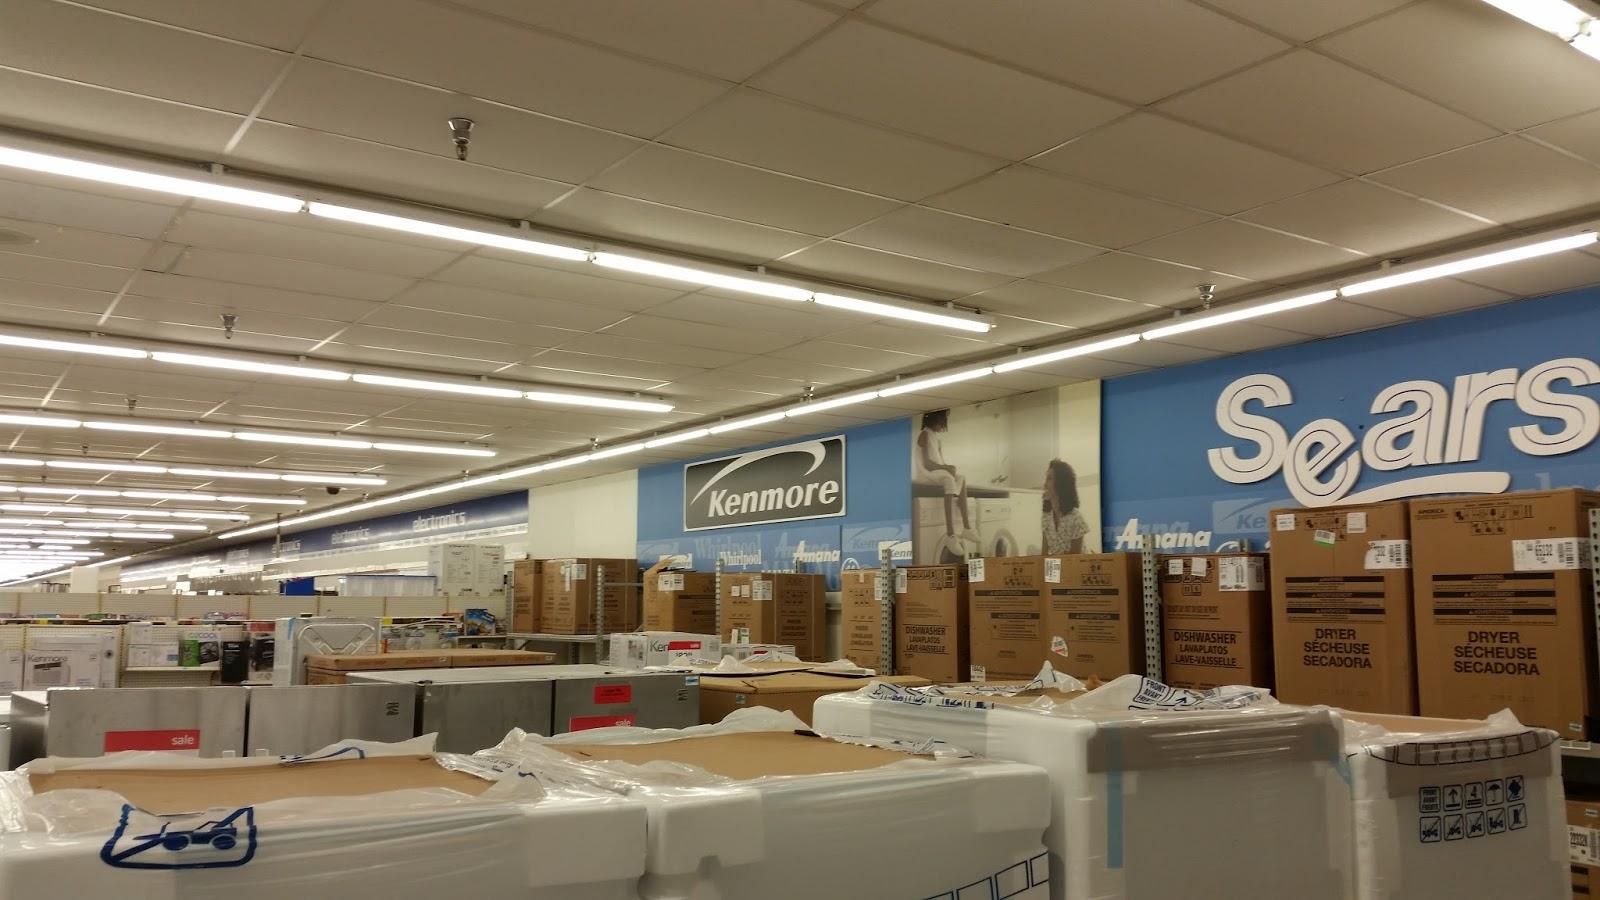 The Louisiana And Texas Retail Blogspot Kmart Elmwood